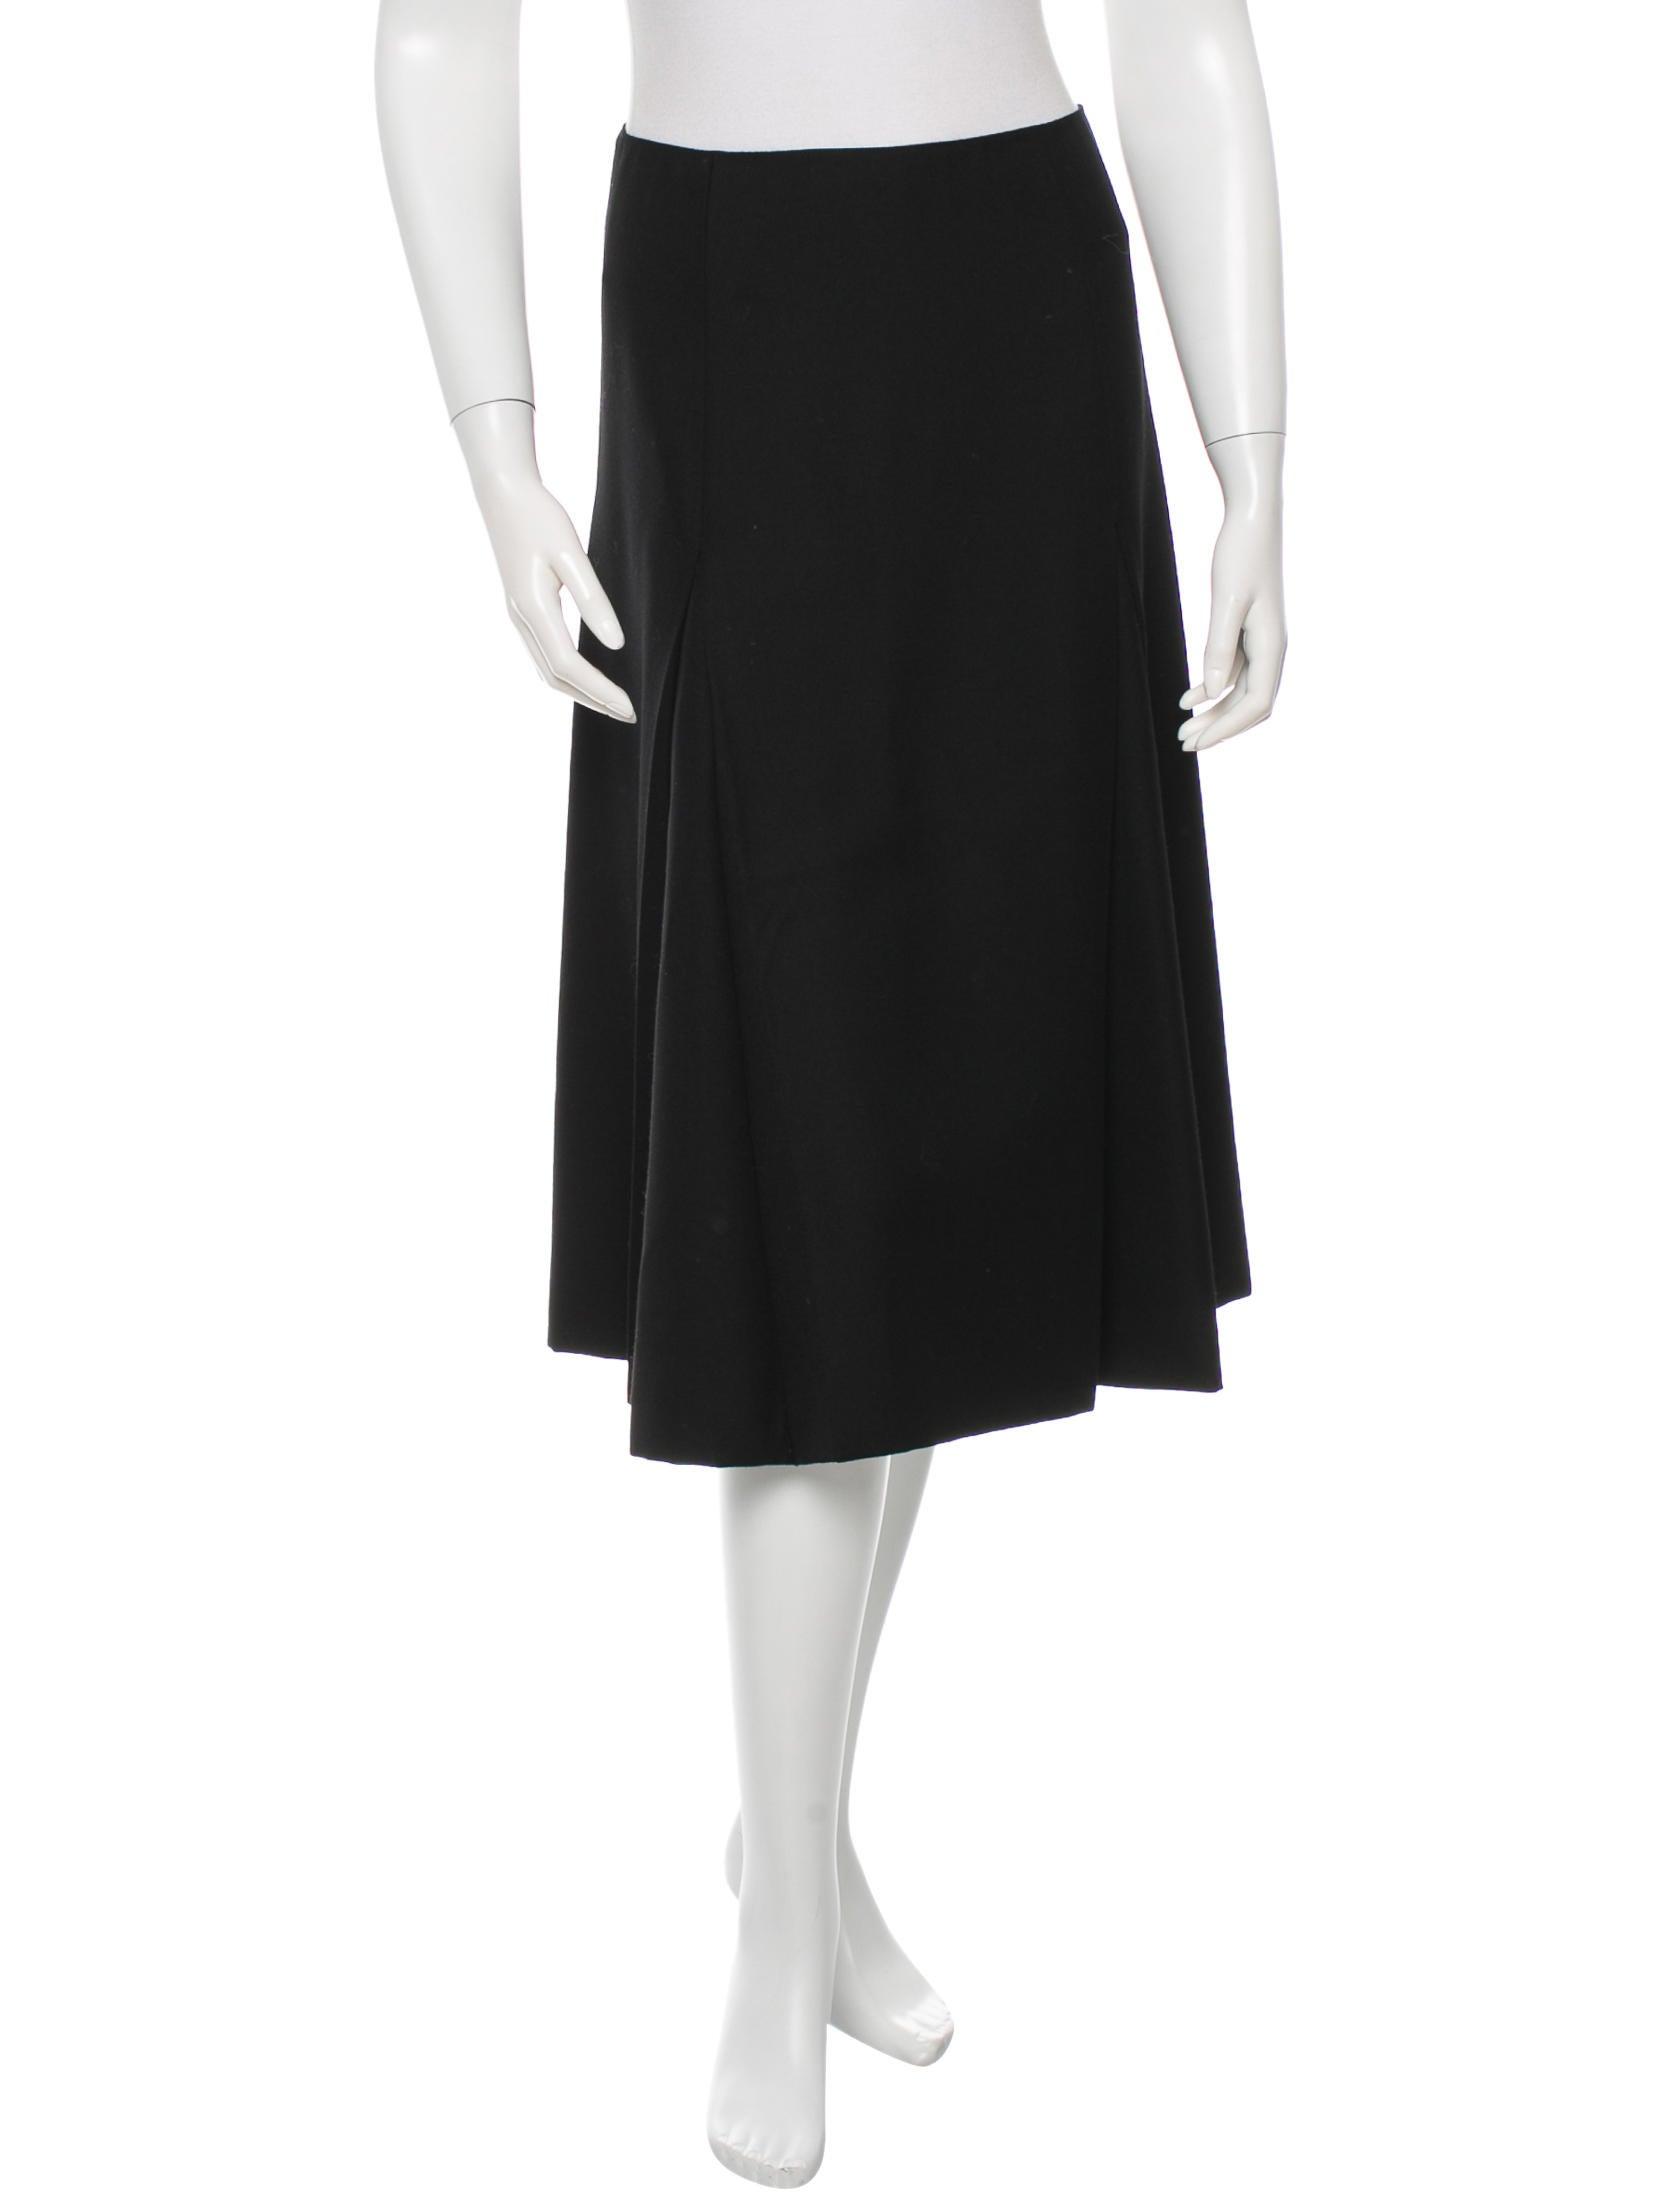 prada wool a line skirt clothing pra88006 the realreal